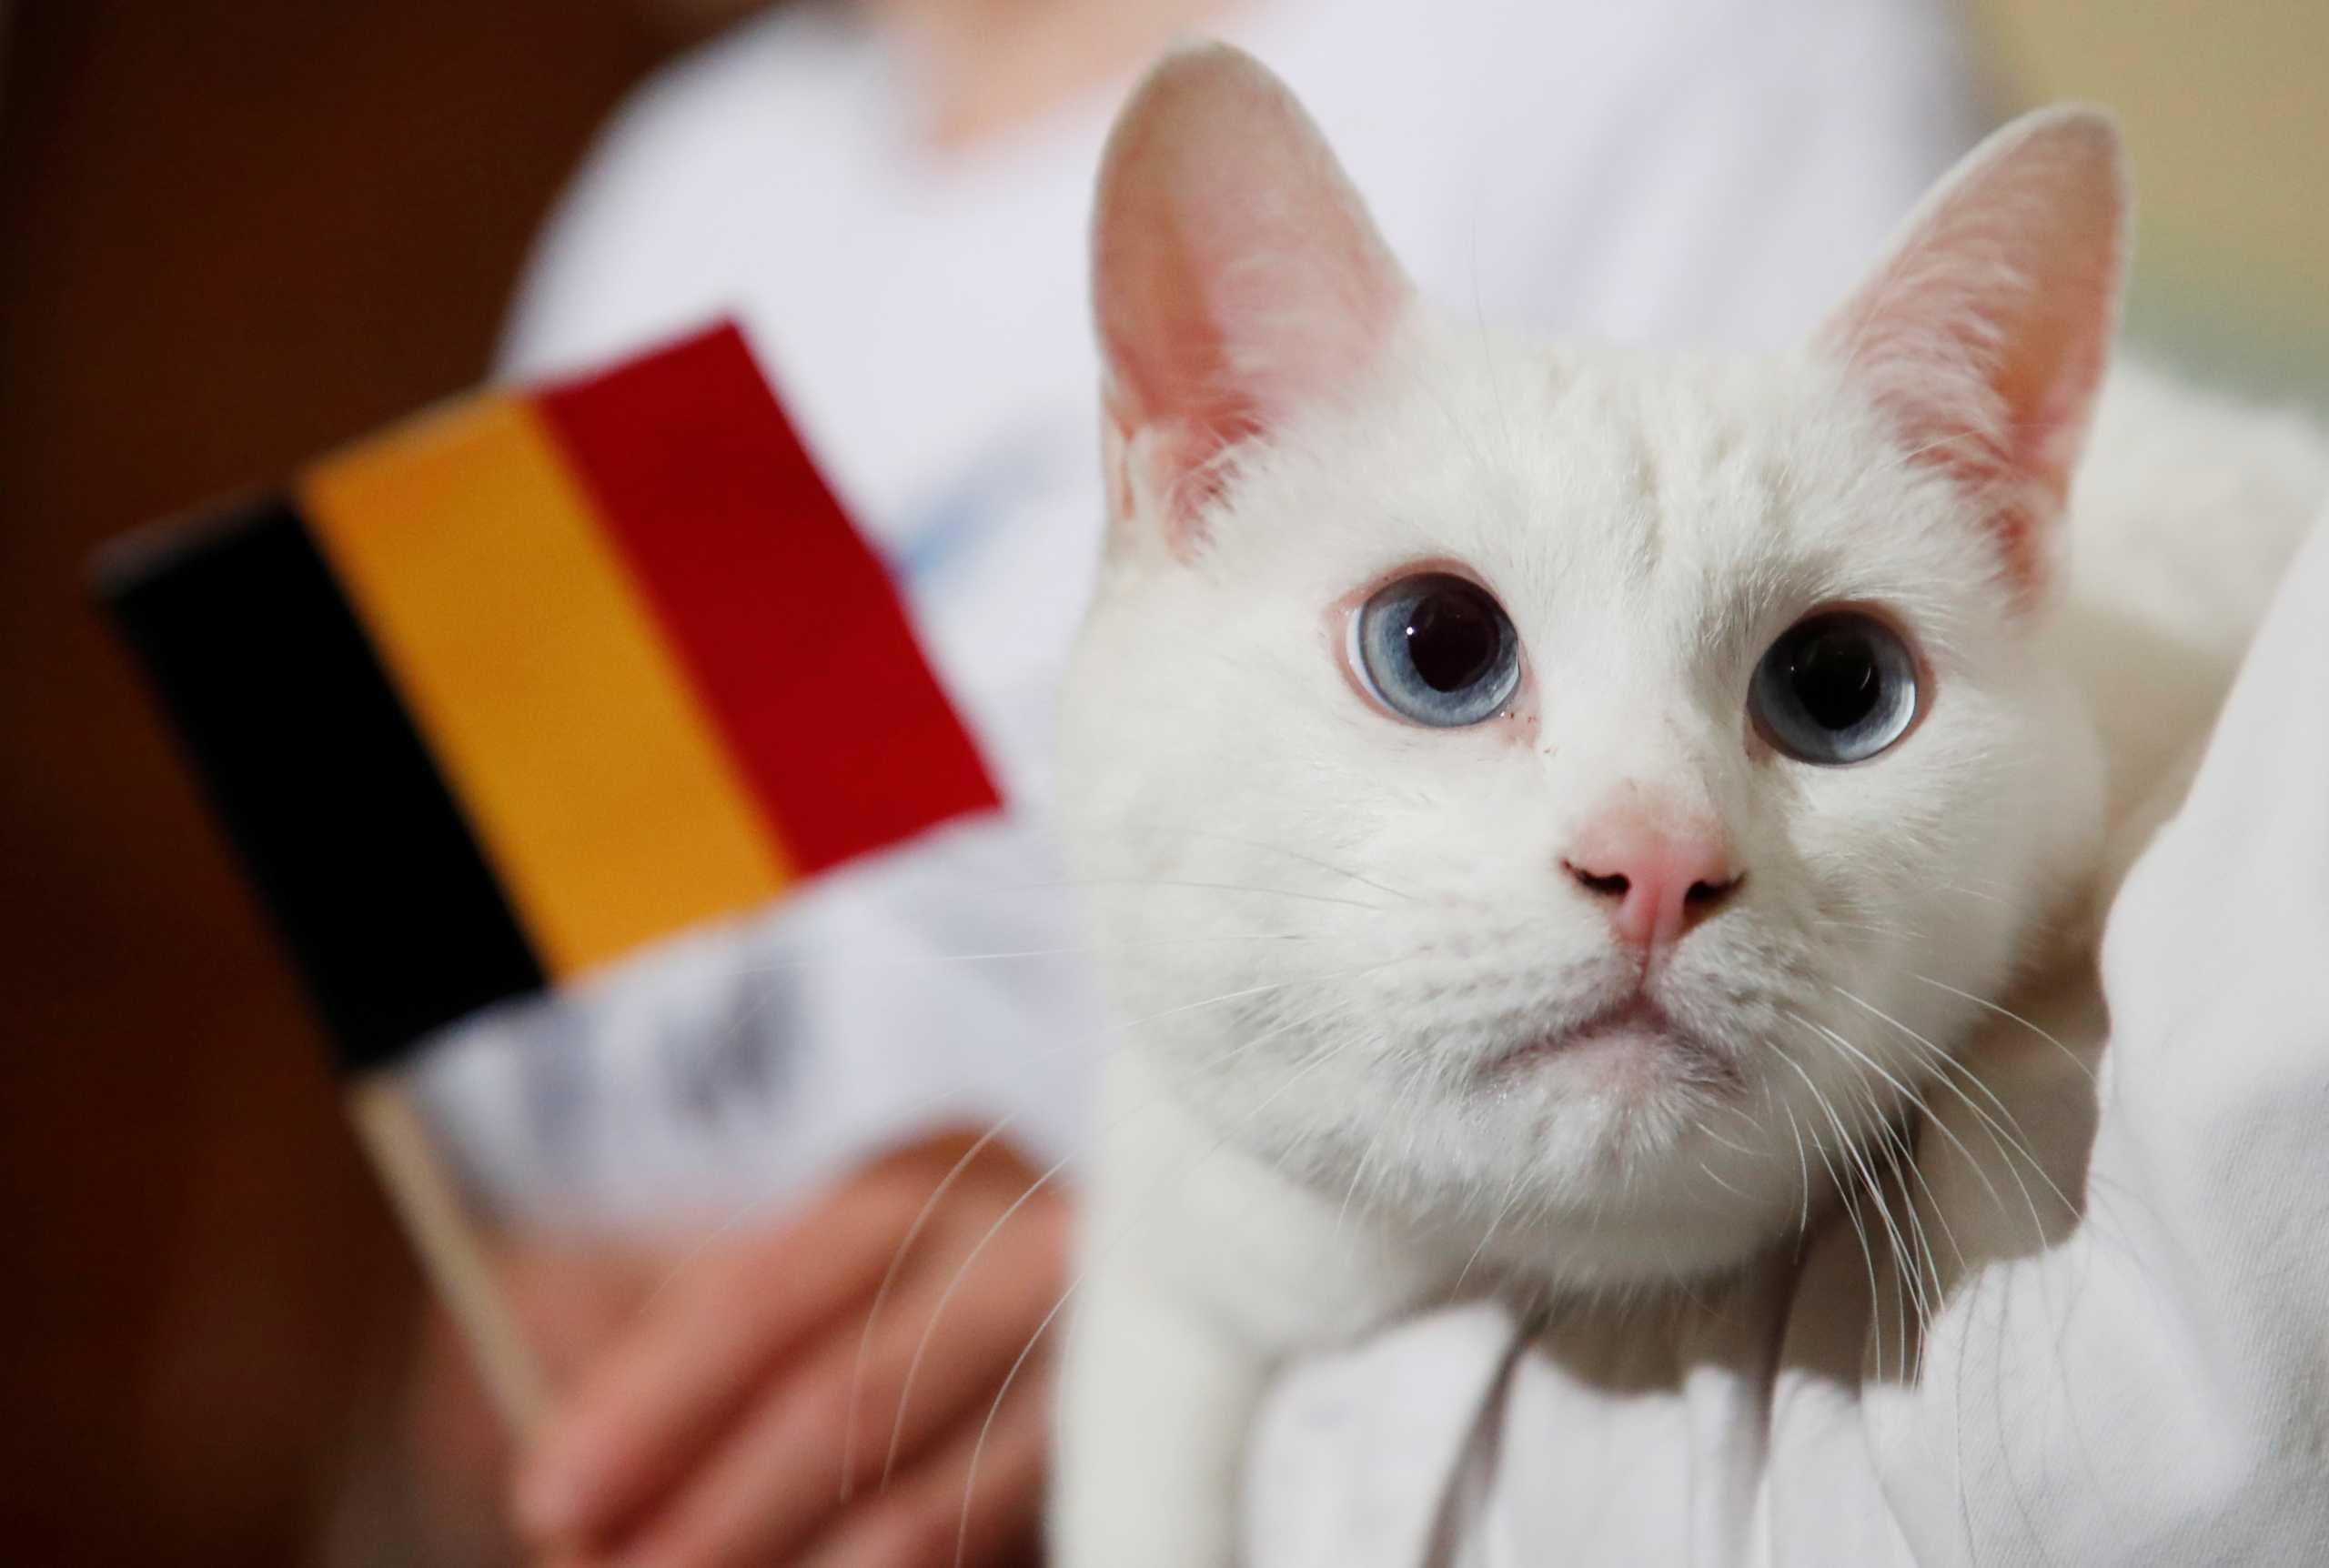 Euro 2020: Ο κουφός γάτος που προβλέπει τα ματς επέστρεψε αλλά «πλήγωσε» τους Ρώσους